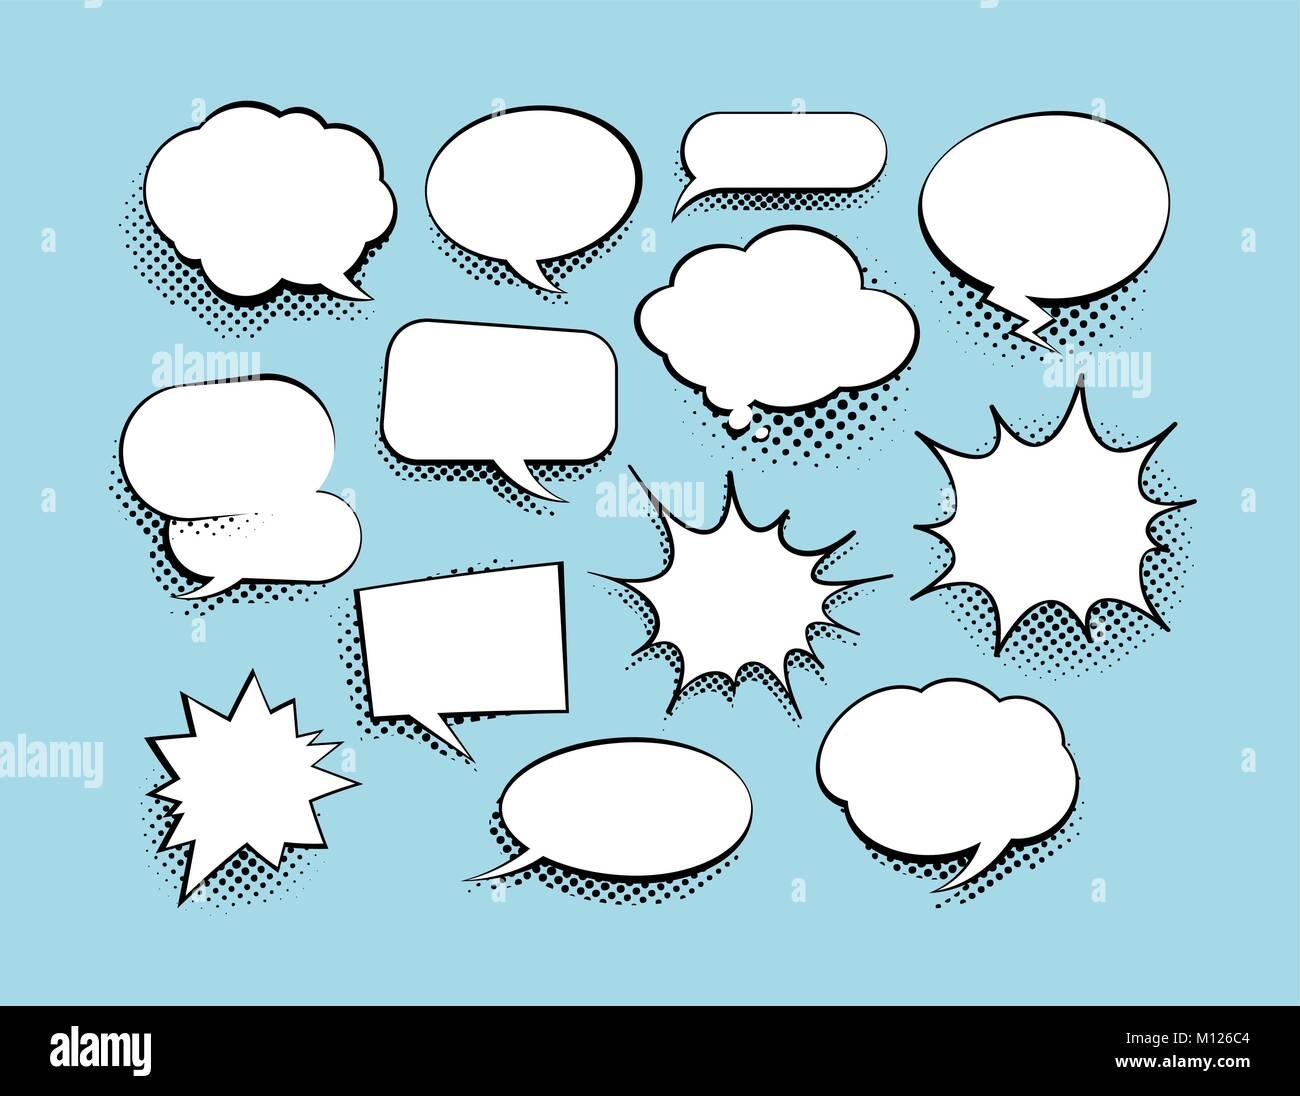 Set of comic art speech bubbles with halftone. Vector illustration - Stock Image